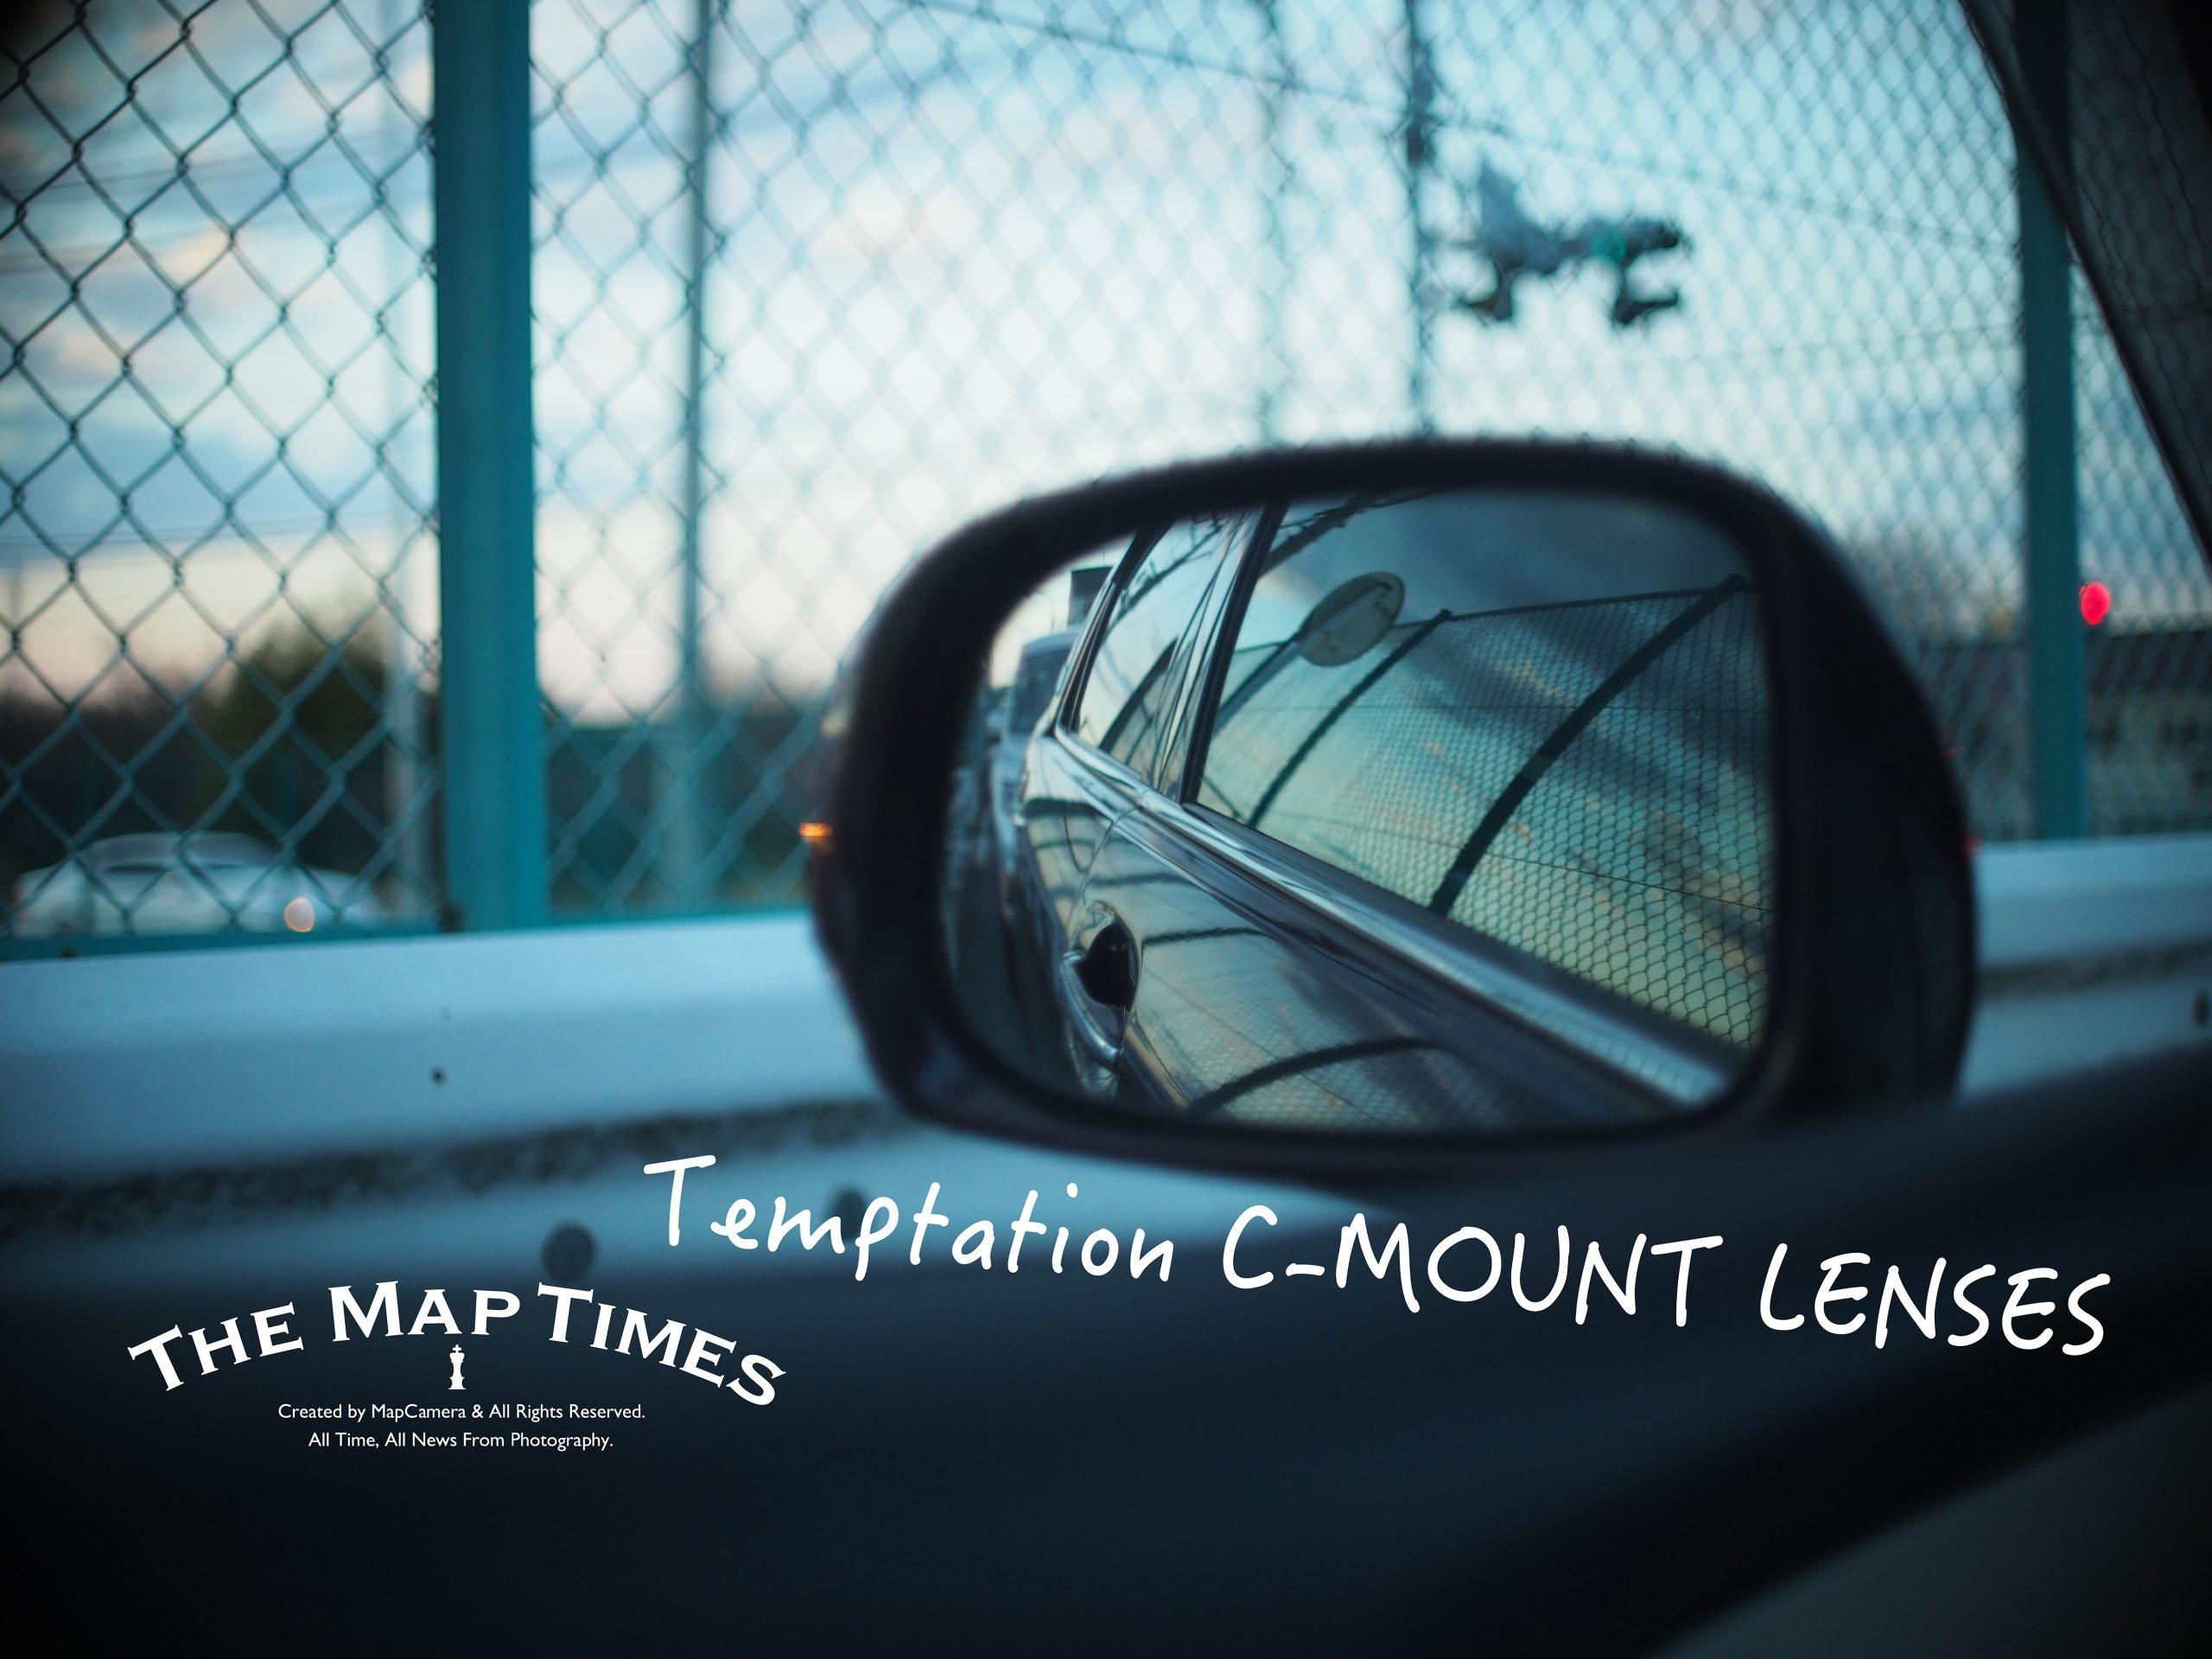 【Micro four Thirds】Temptation C-MOUNT LENSES